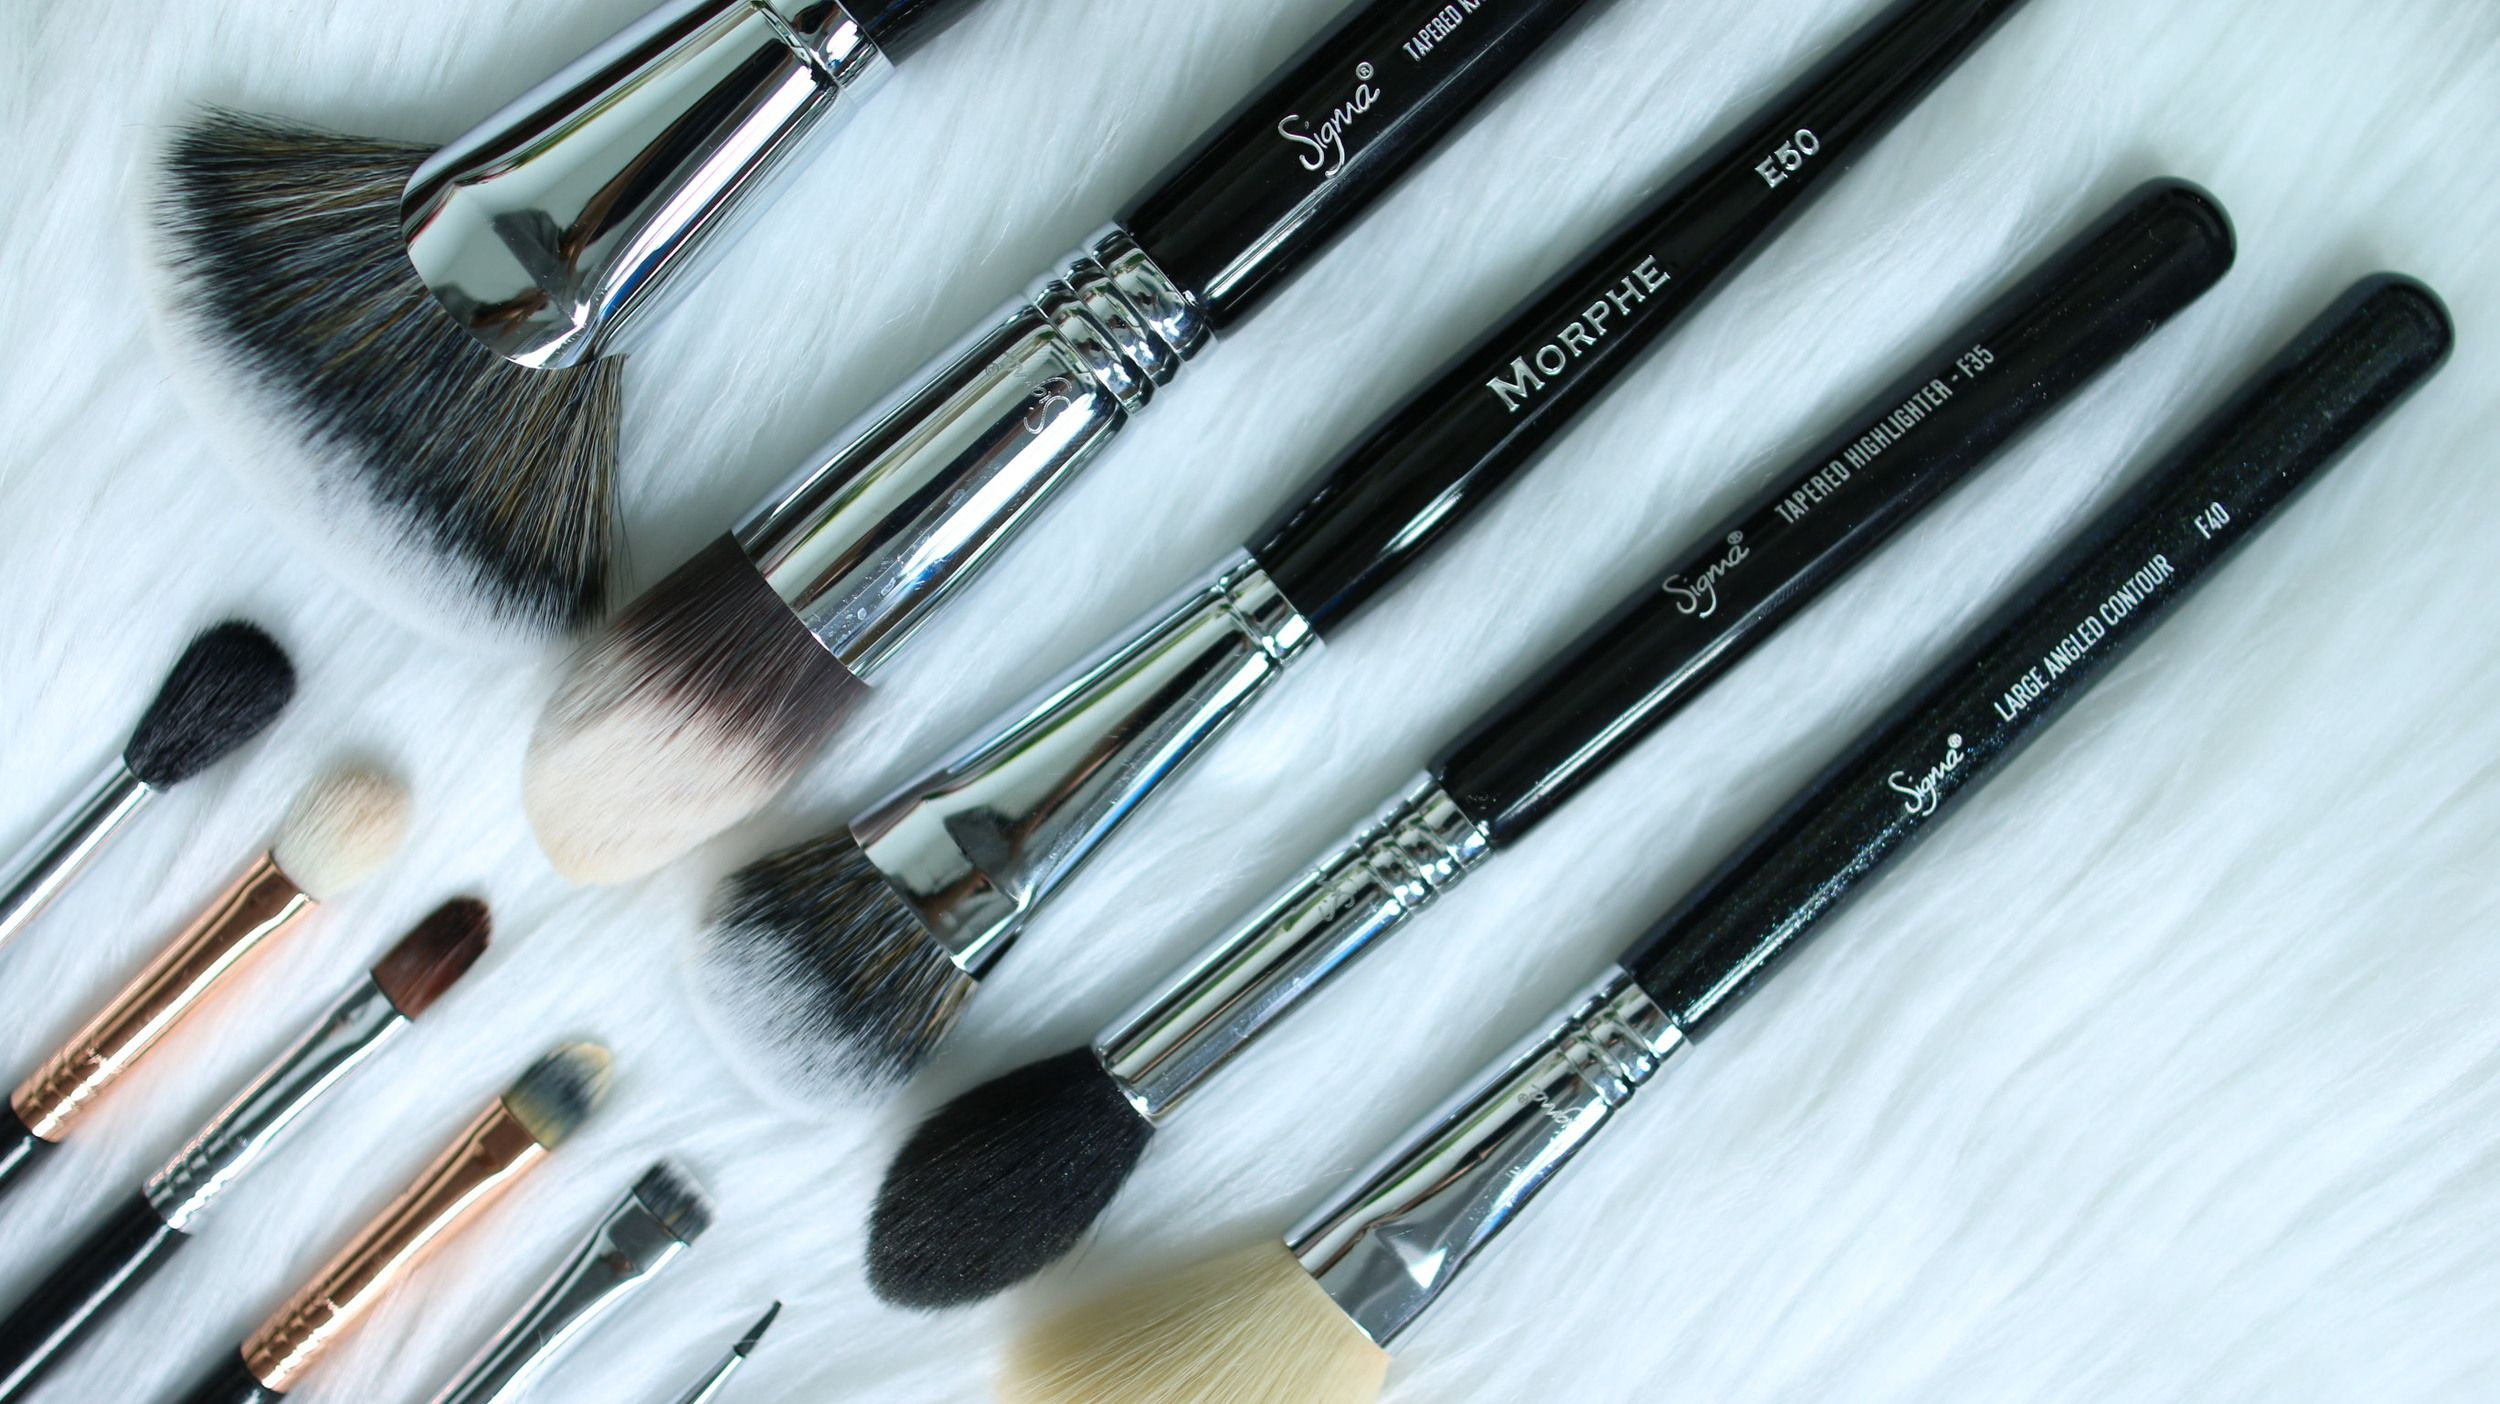 Must Have Makeup Brushes Makeup brushes, Makeup, Best